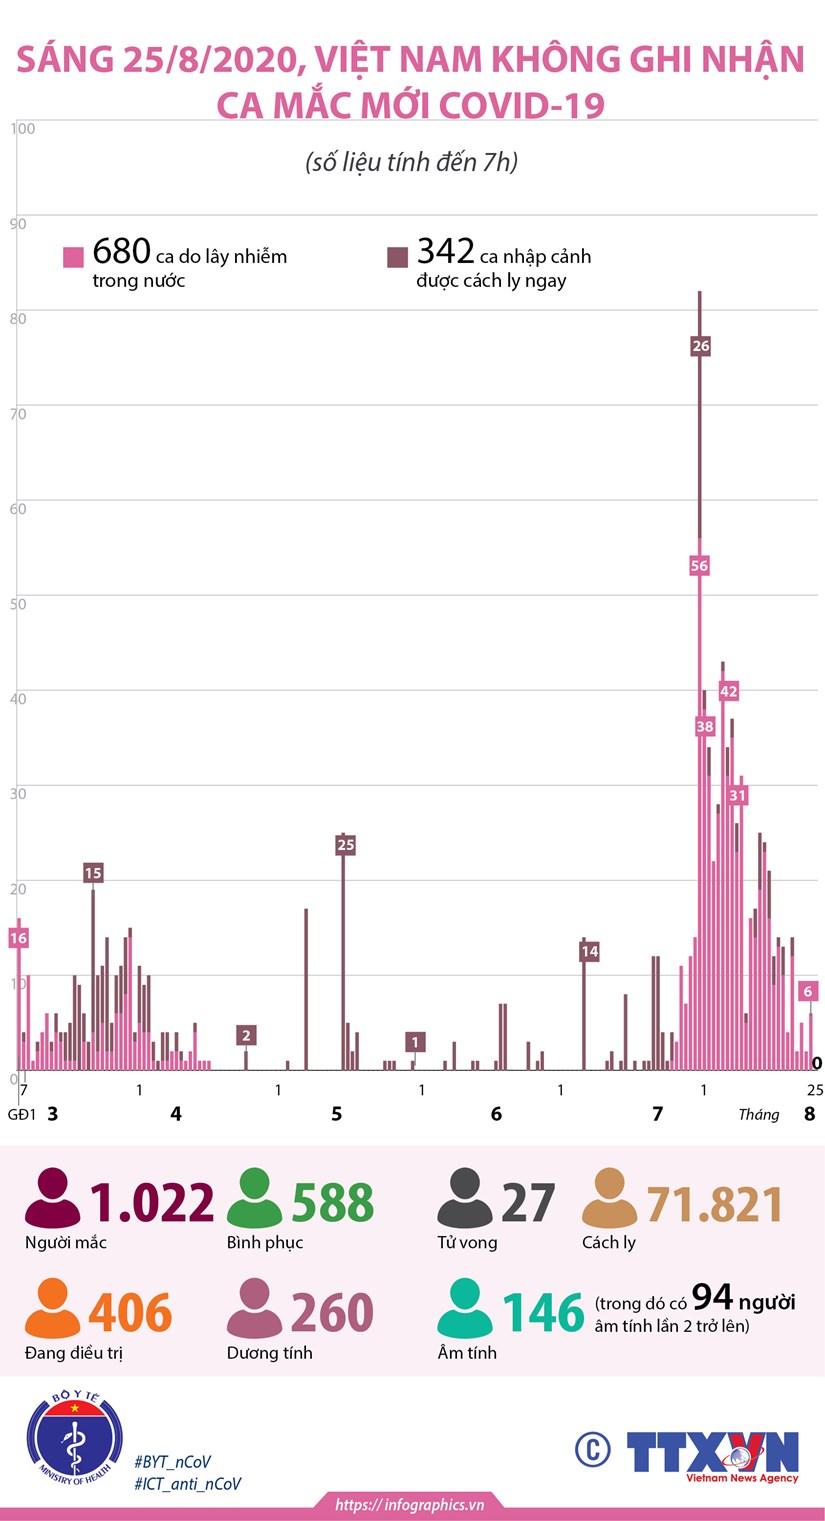 [Infographics] 146 benh nhan da am tinh voi virus SARS-CoV-2 hinh anh 1